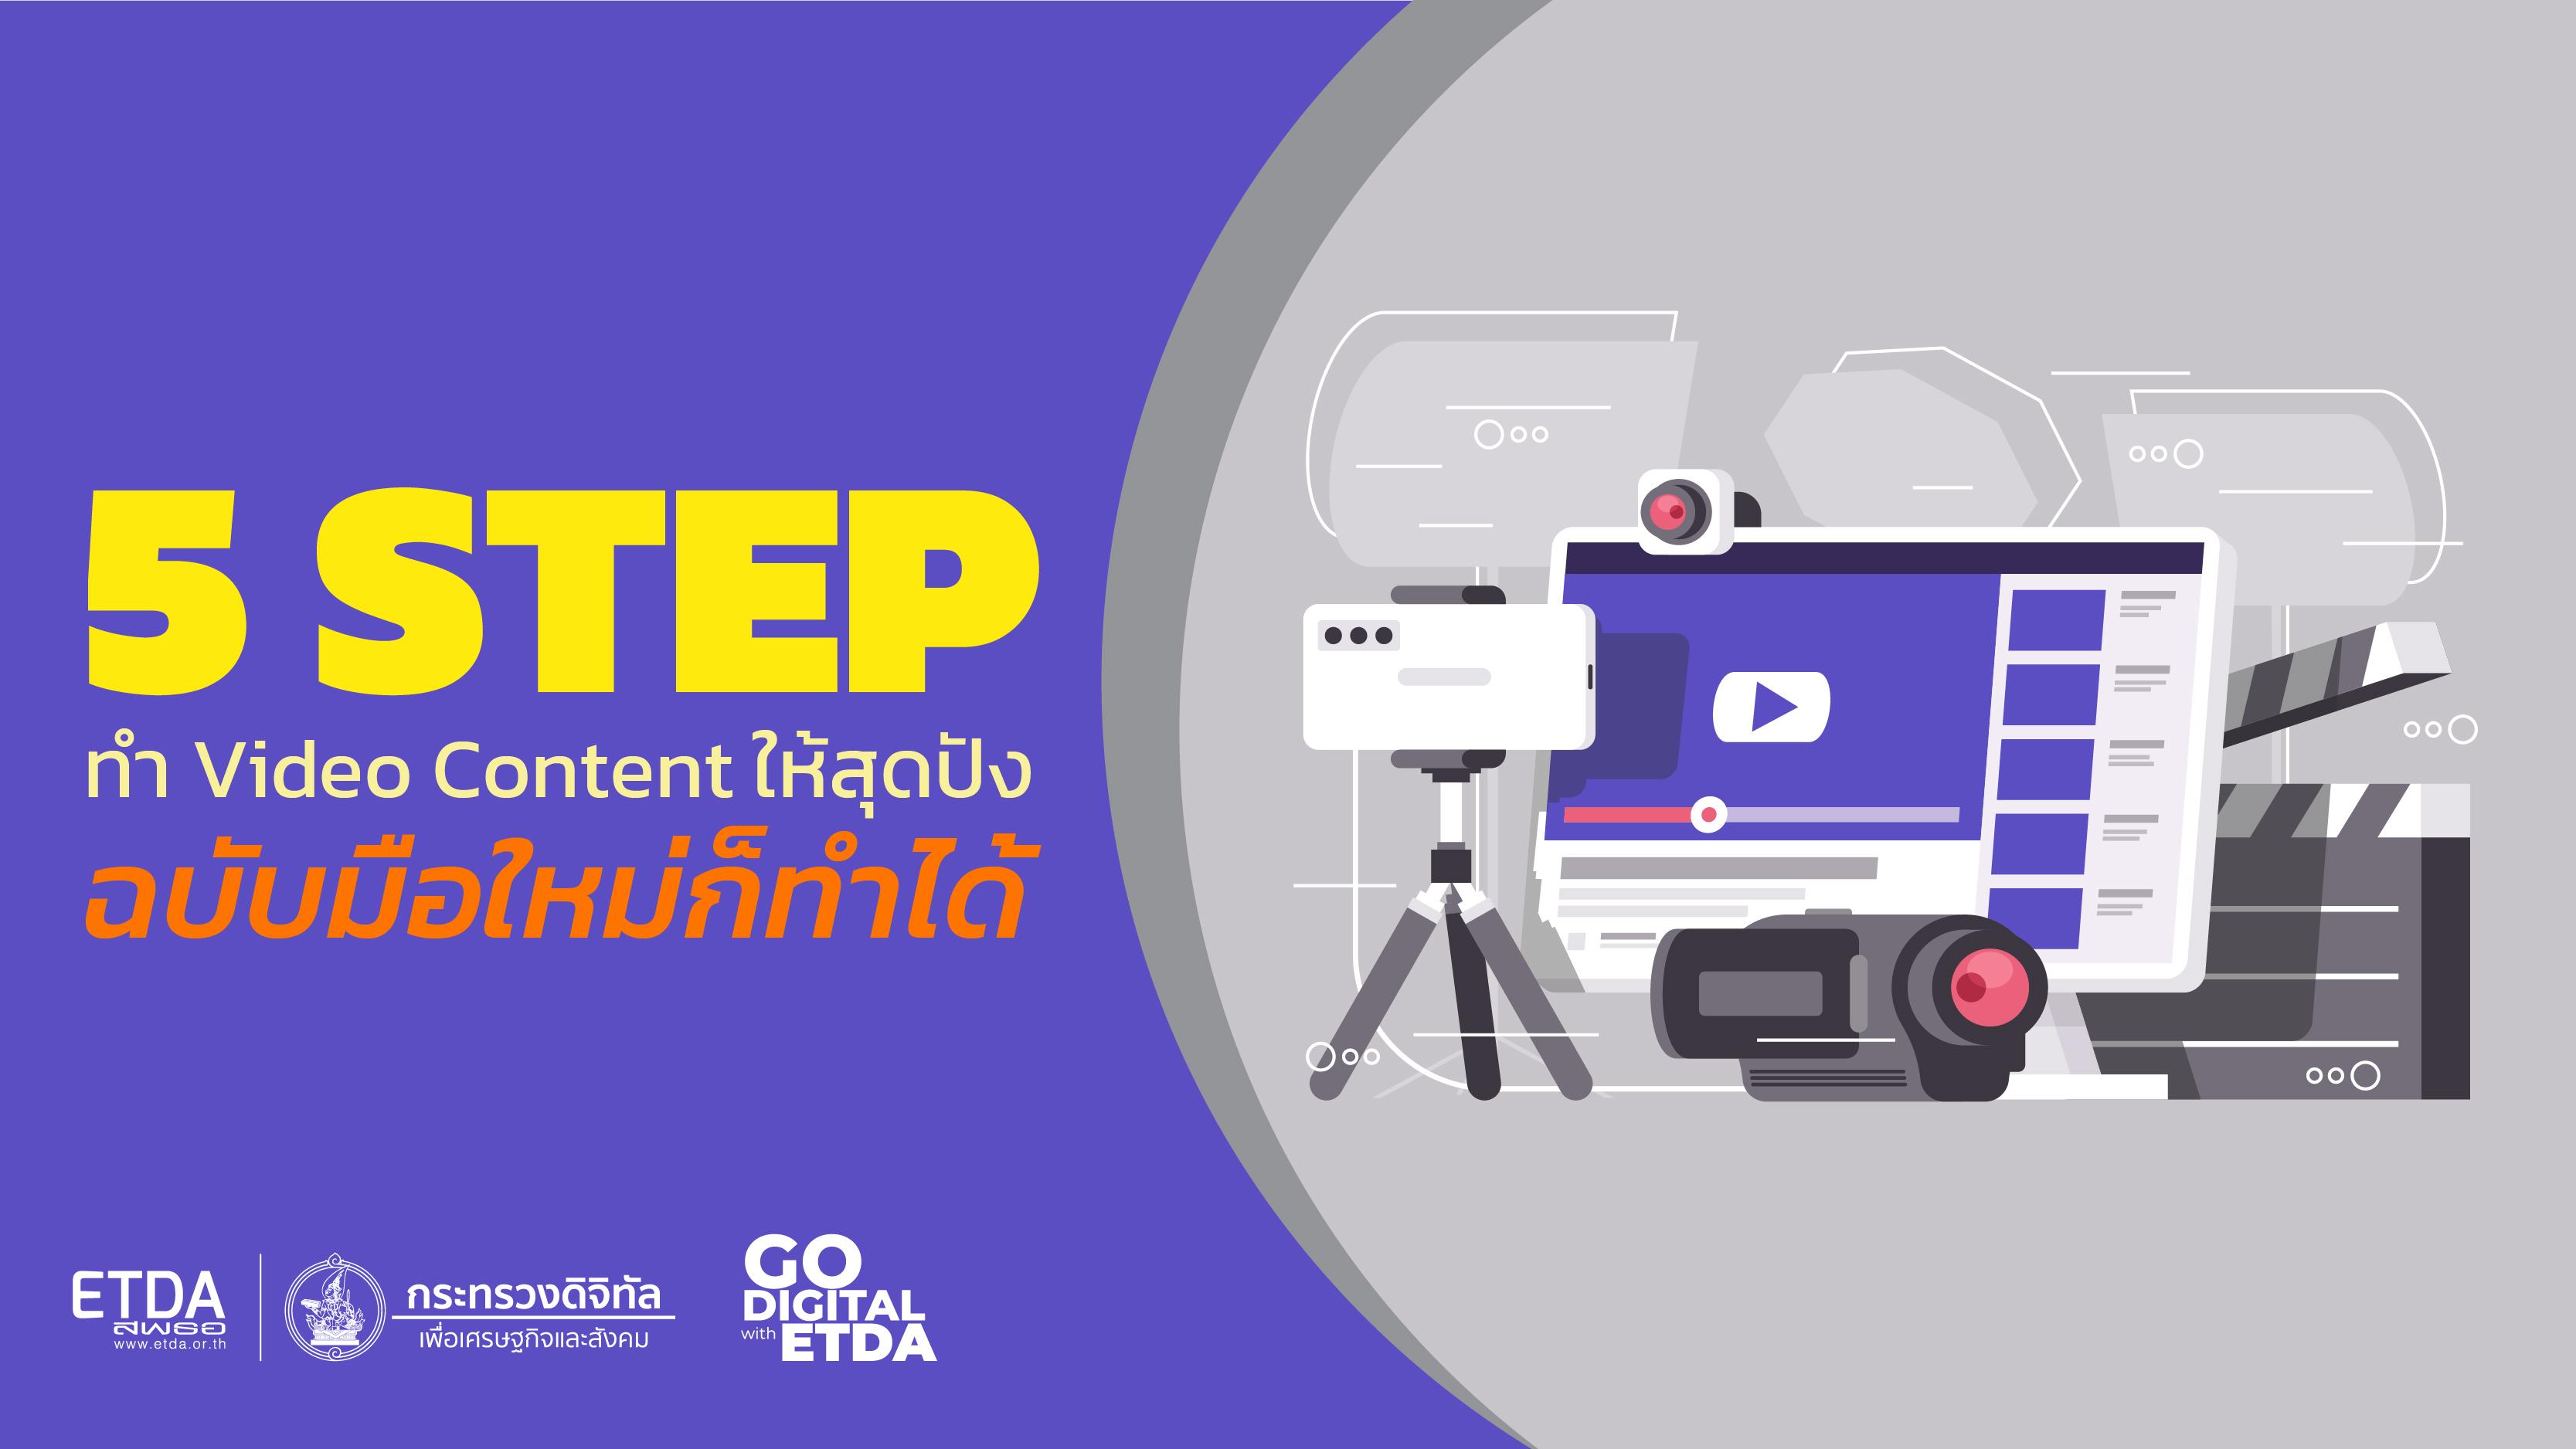 5 STEP ทำ Video Content ให้สุดปัง แบบง่าย ๆ สไตล์มือใหม่ก็ทำได้